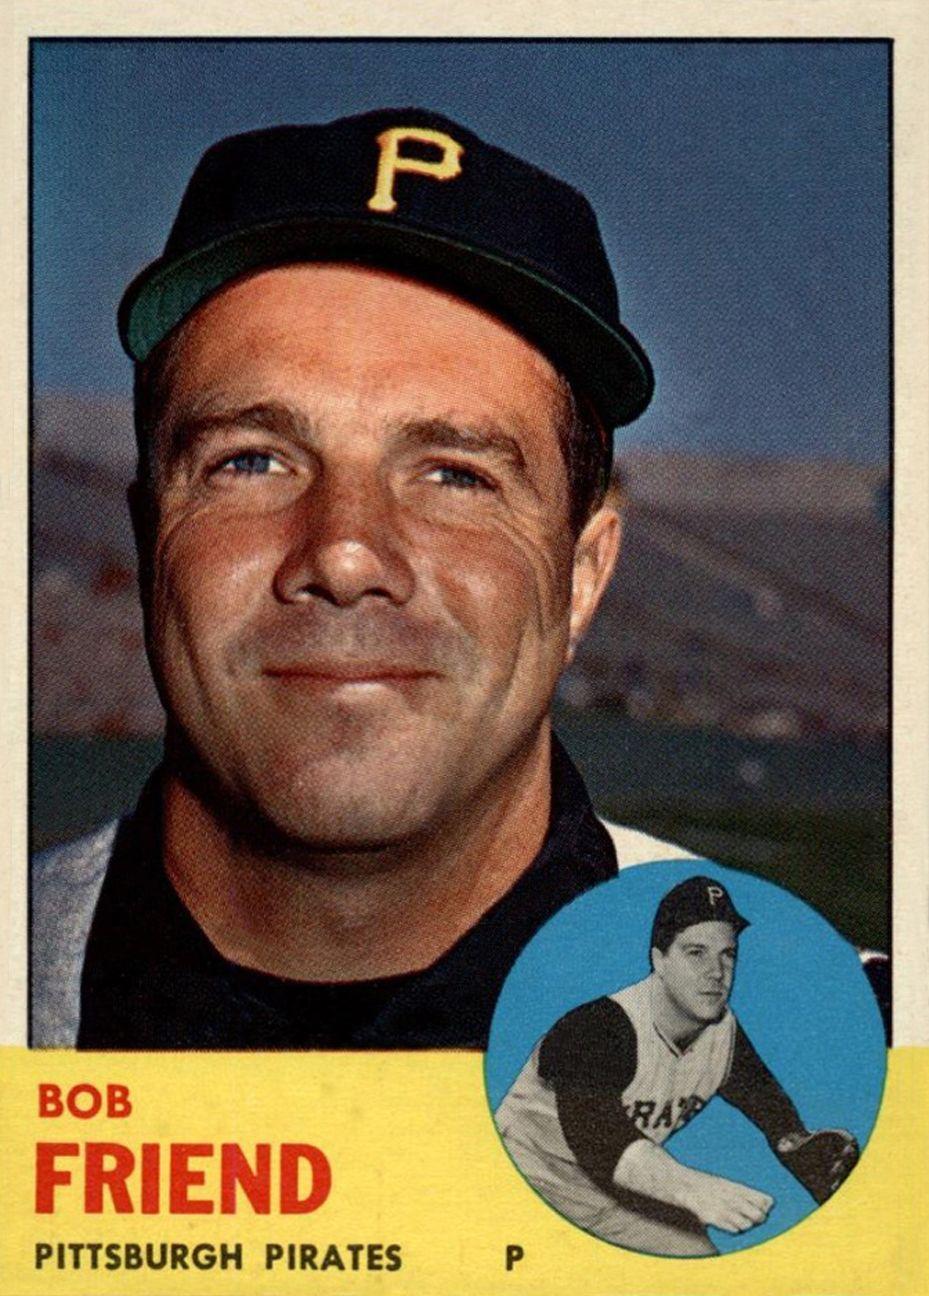 1962 Topps Stamps Bob Friend Pittsburgh Pirates Baseball Card